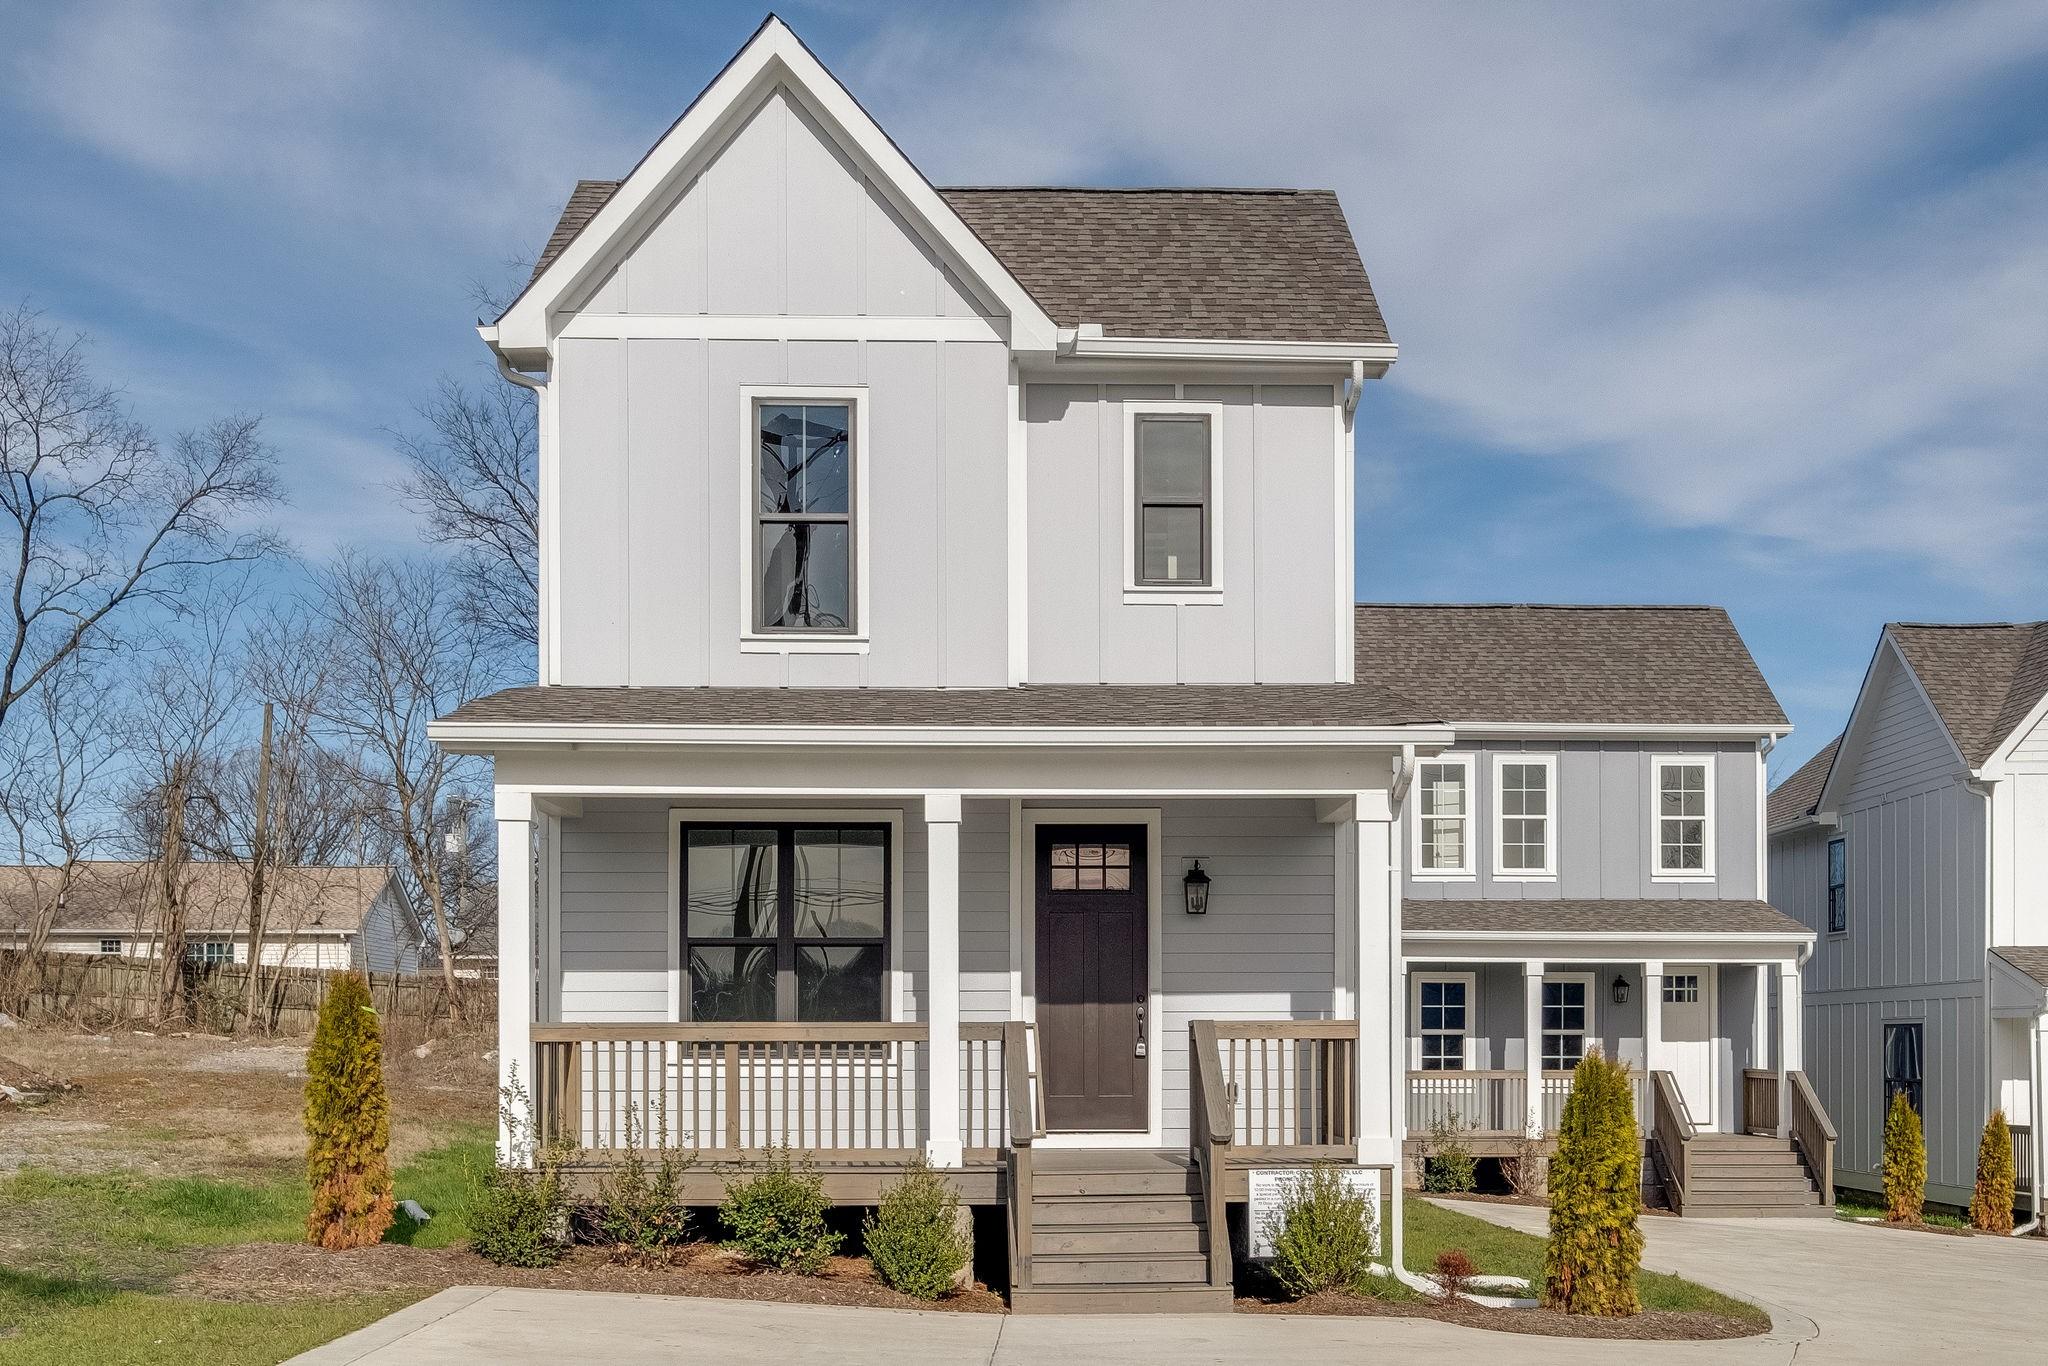 6118B Robertson Ave, Nashville, TN 37209 - Nashville, TN real estate listing